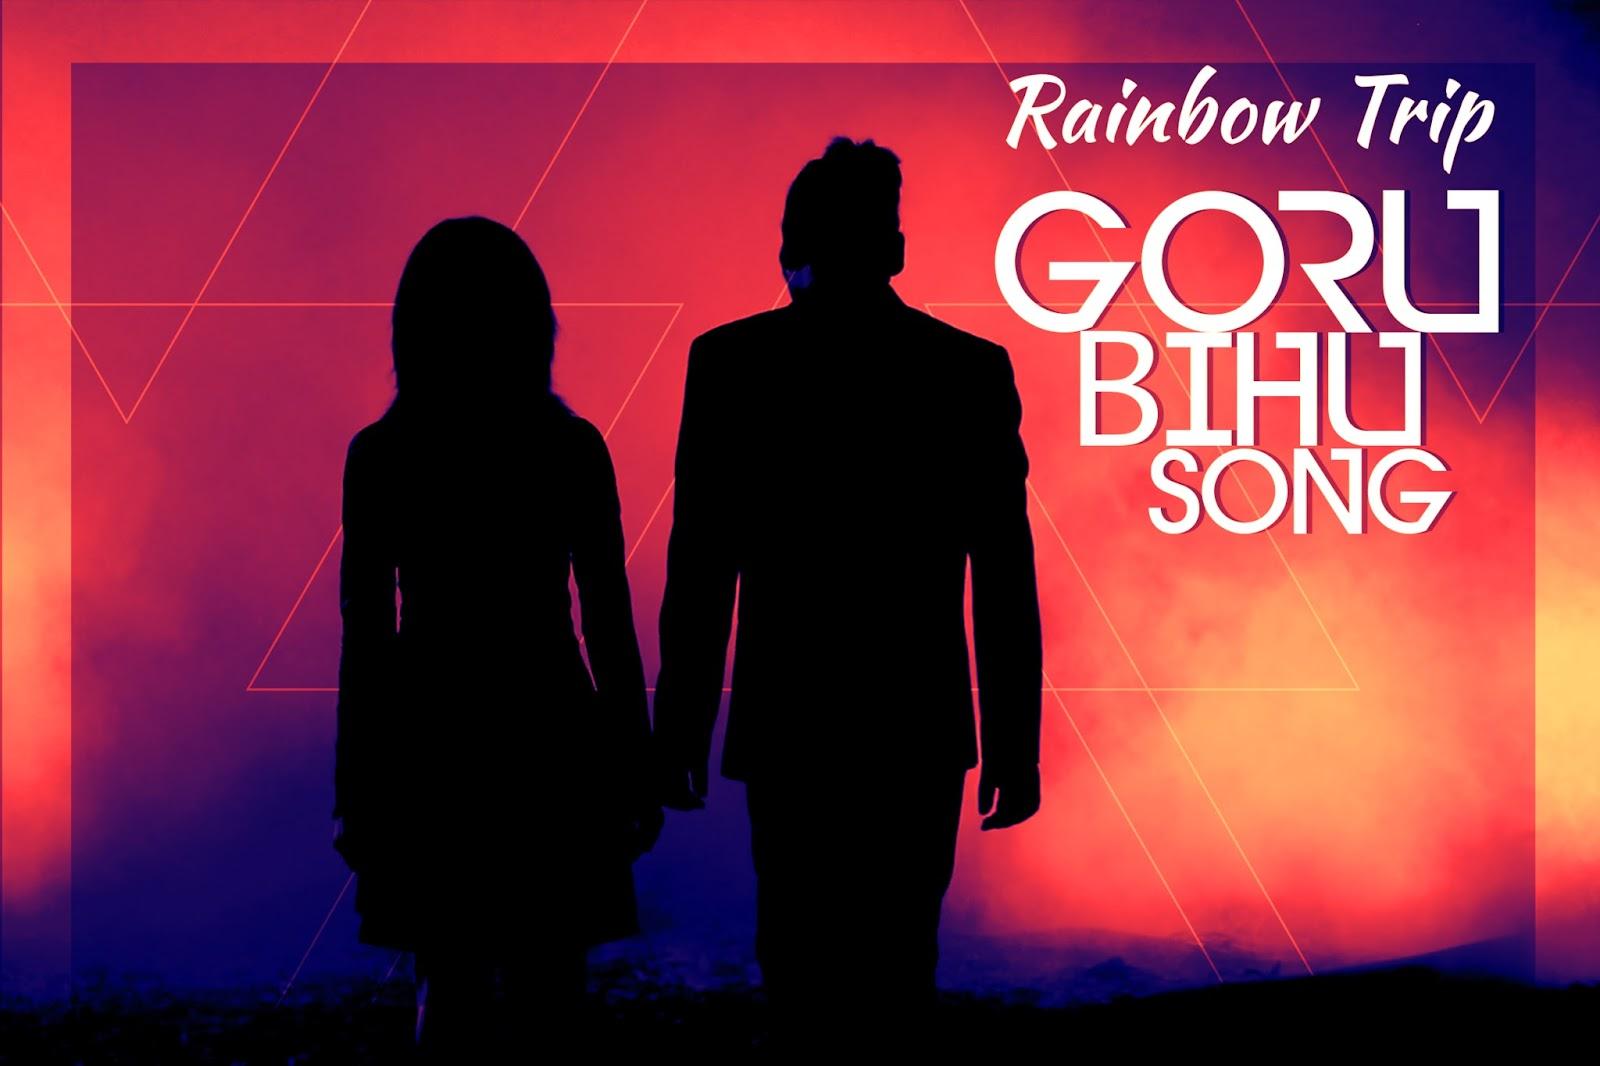 Rainbow Trip - Goru Bihu Song 1.tif